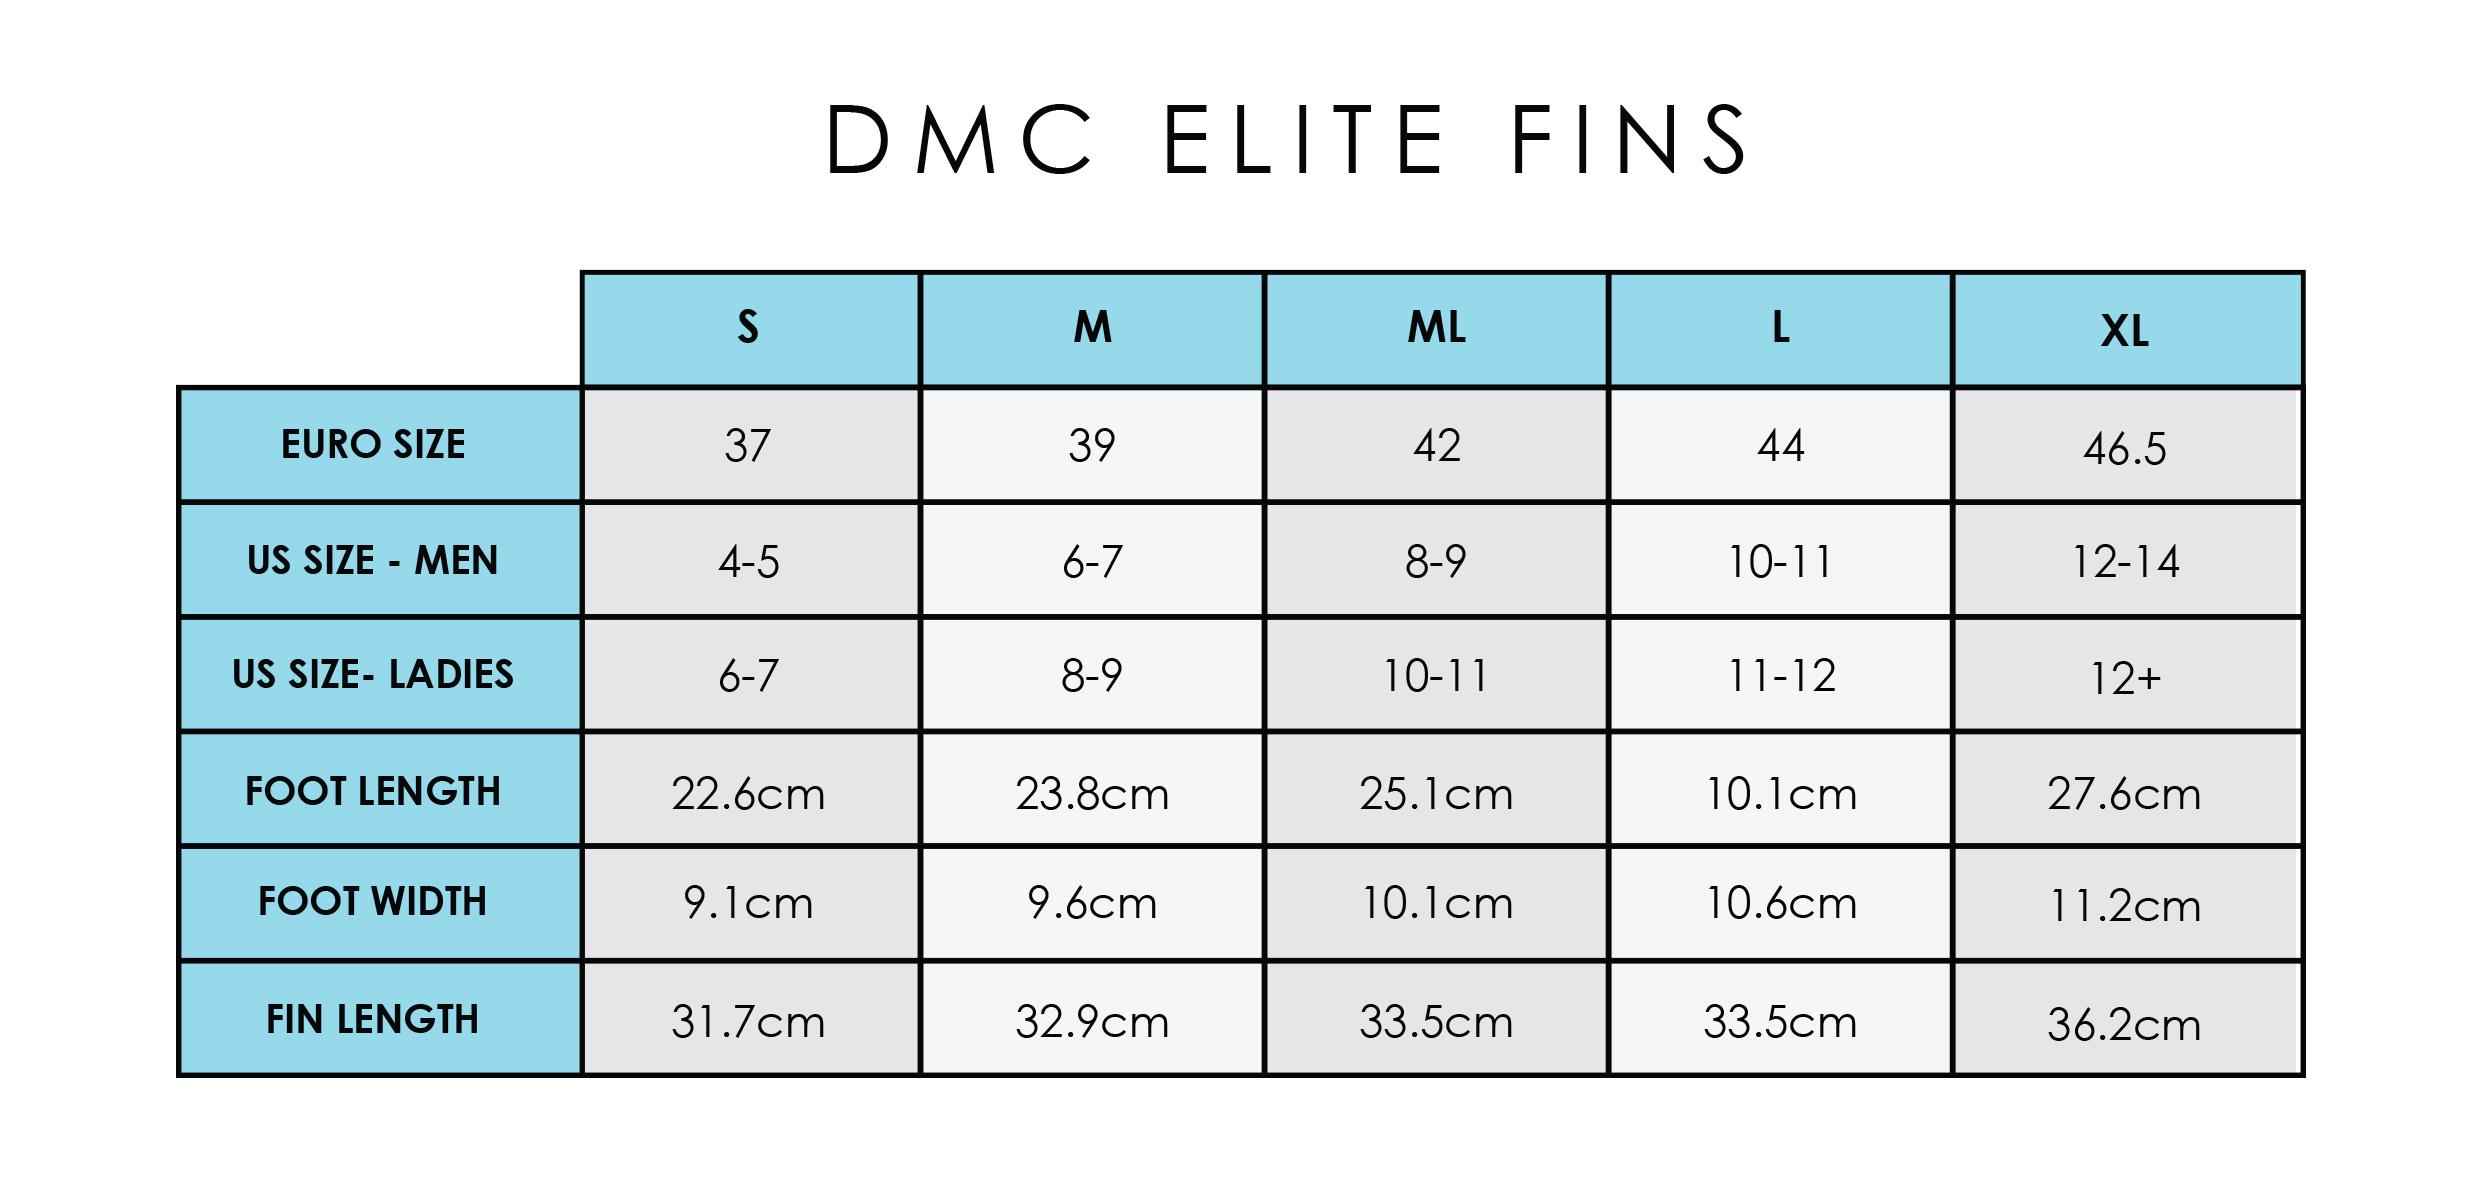 dmc-elite-fins-size-chart.jpg